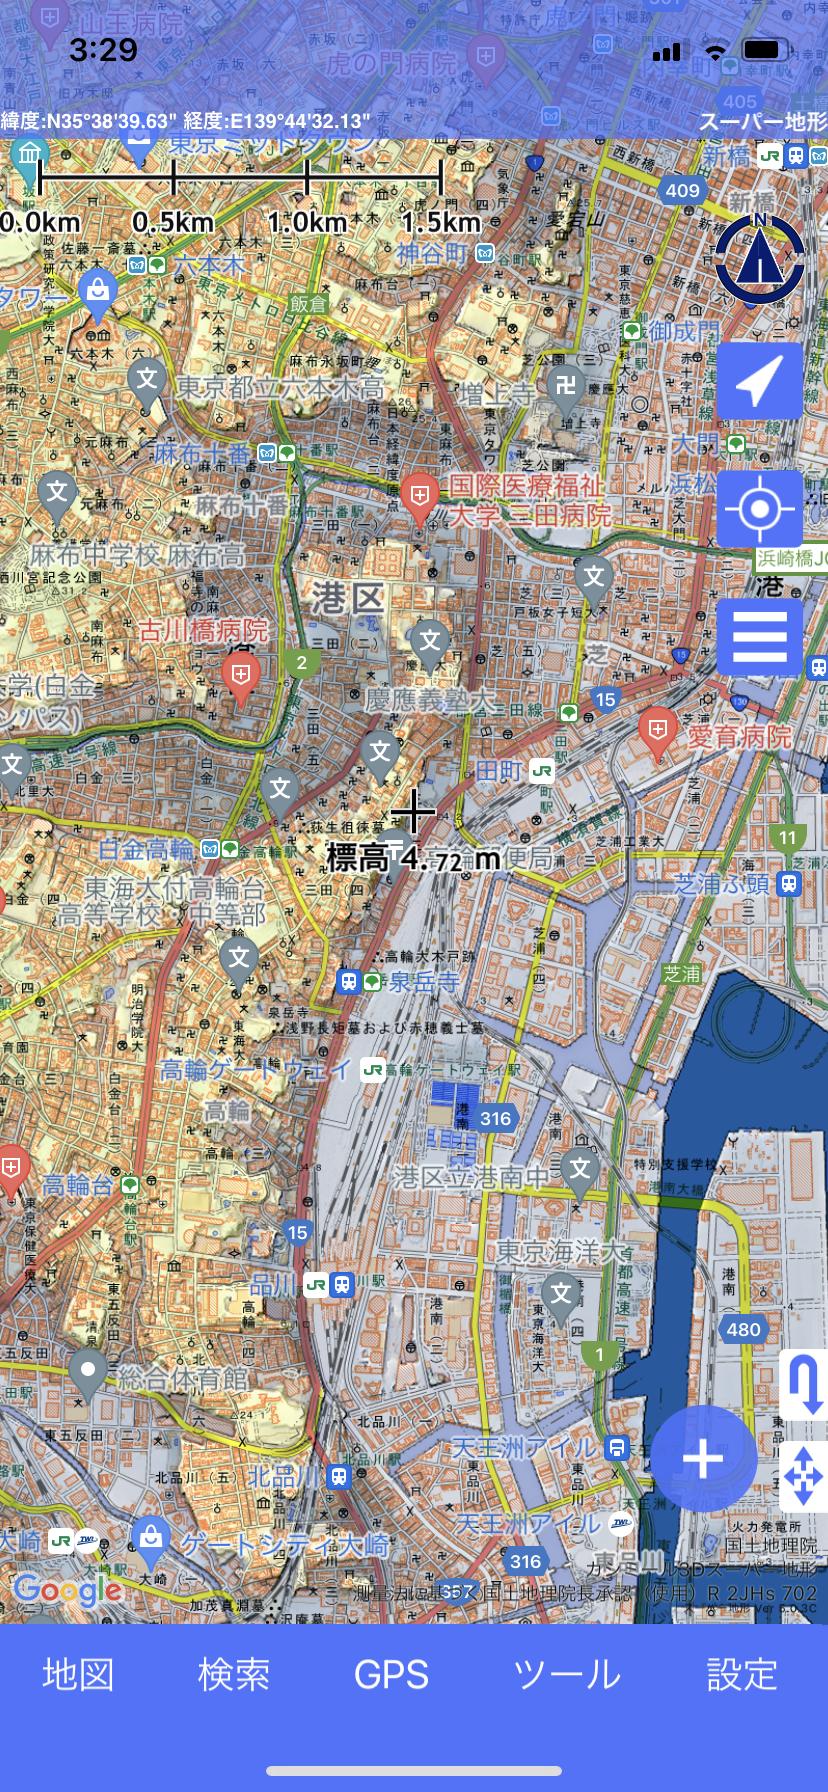 kashmir3D(カシミール3D)スーパー地形を使ったヨコさんのクチコミ画像1